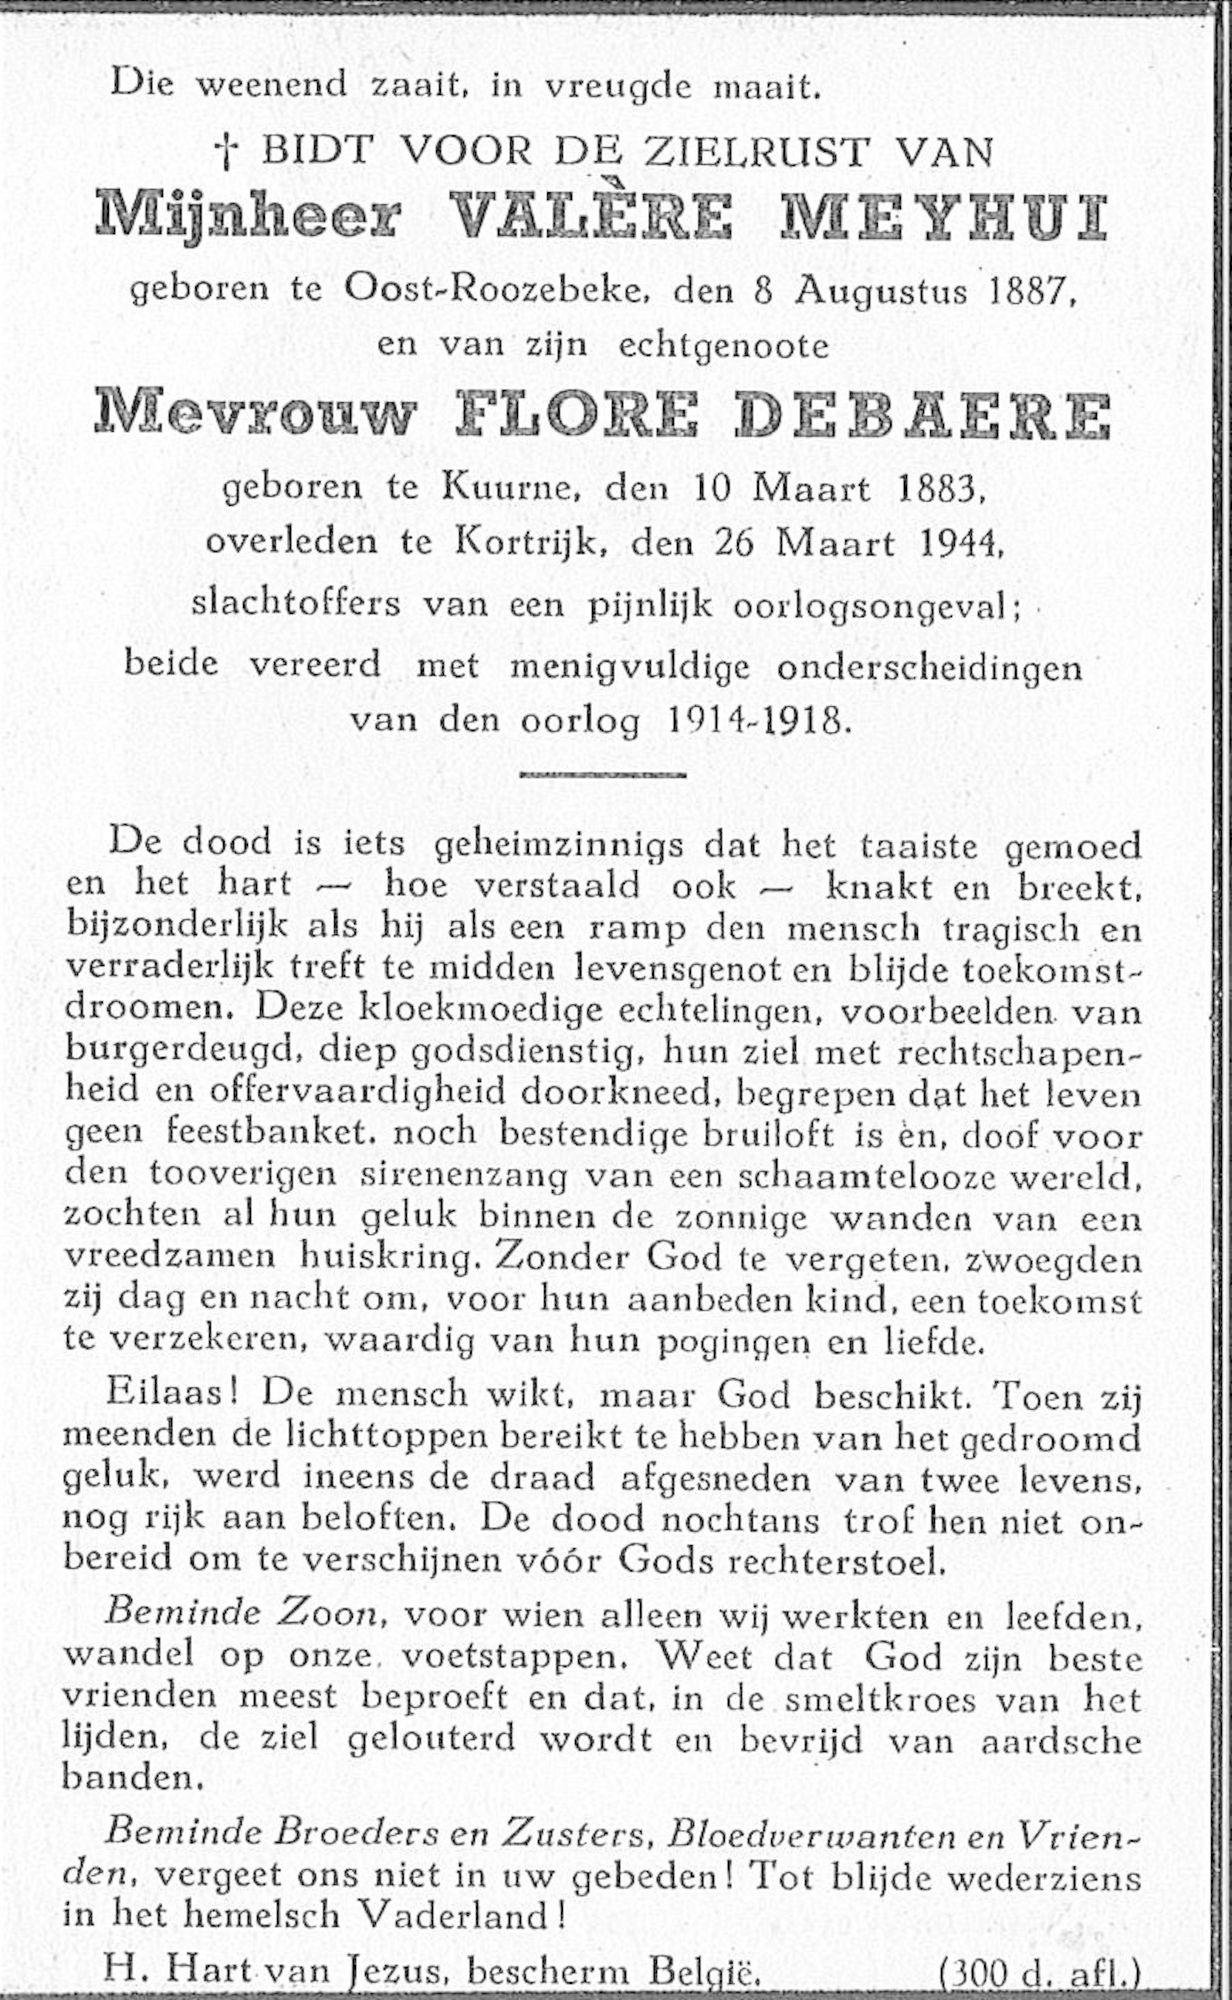 Flore Debaere